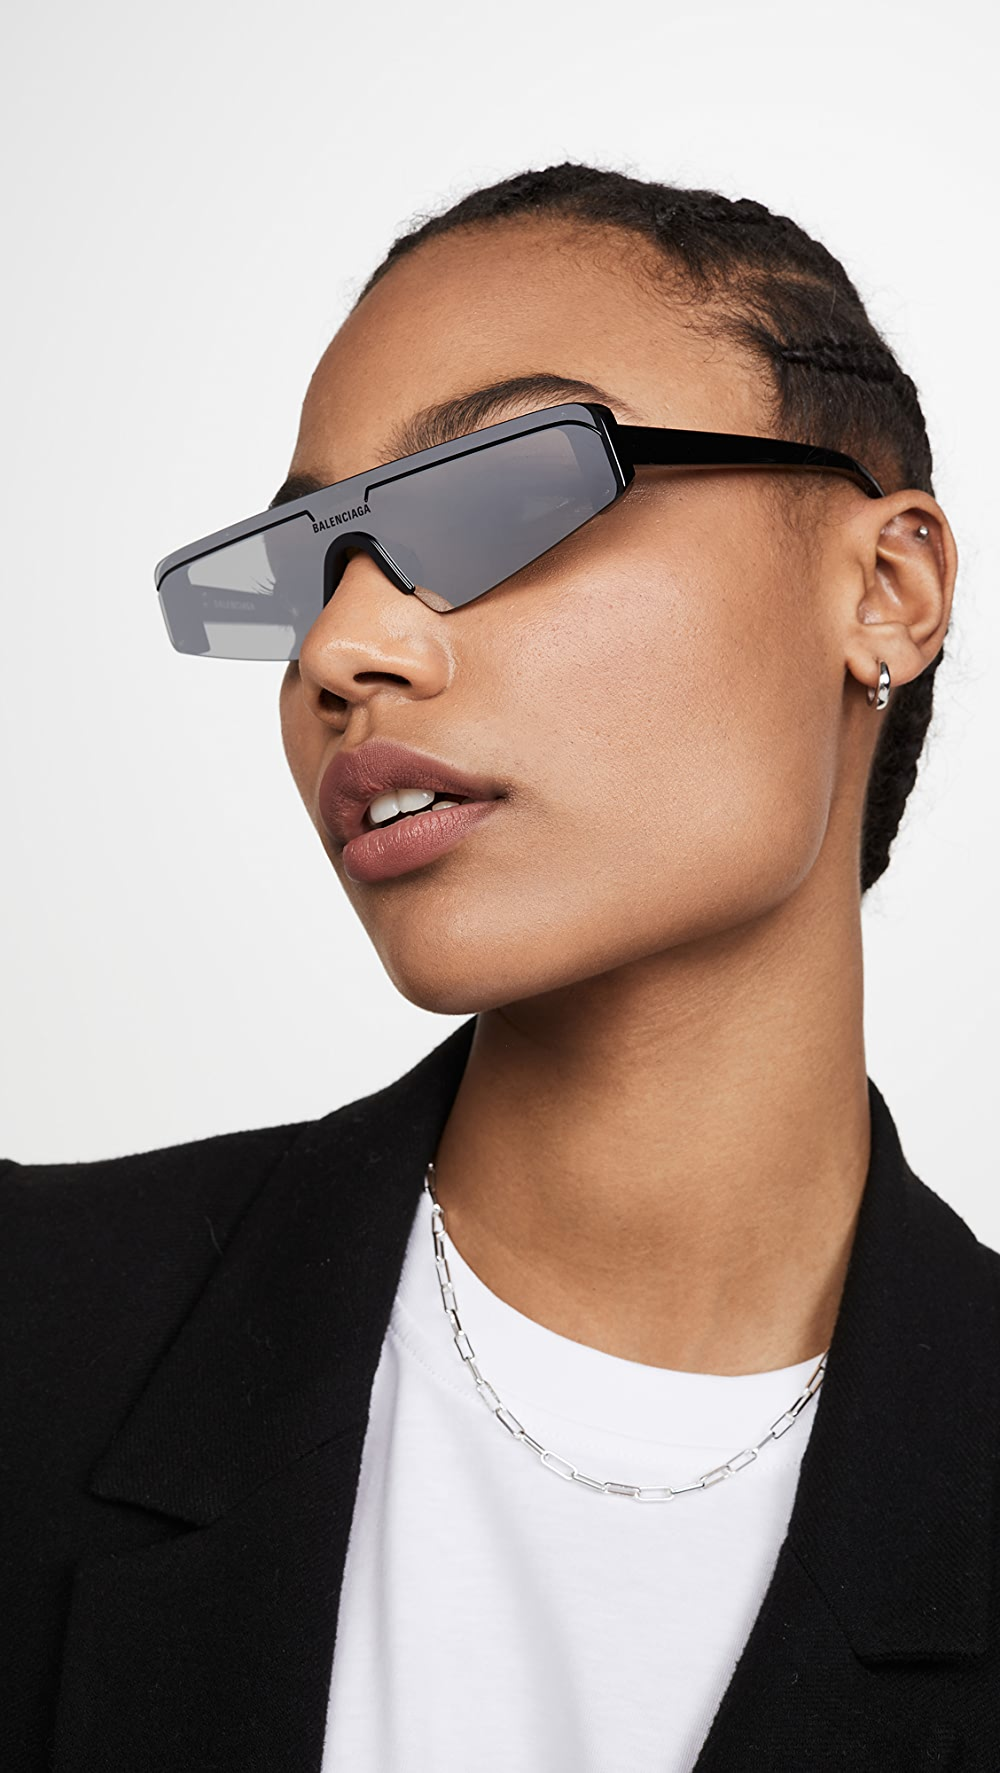 Shop For Cheap Balenciaga - Extreme Narrow Ski Goggle Sunglasses High Quality Goods